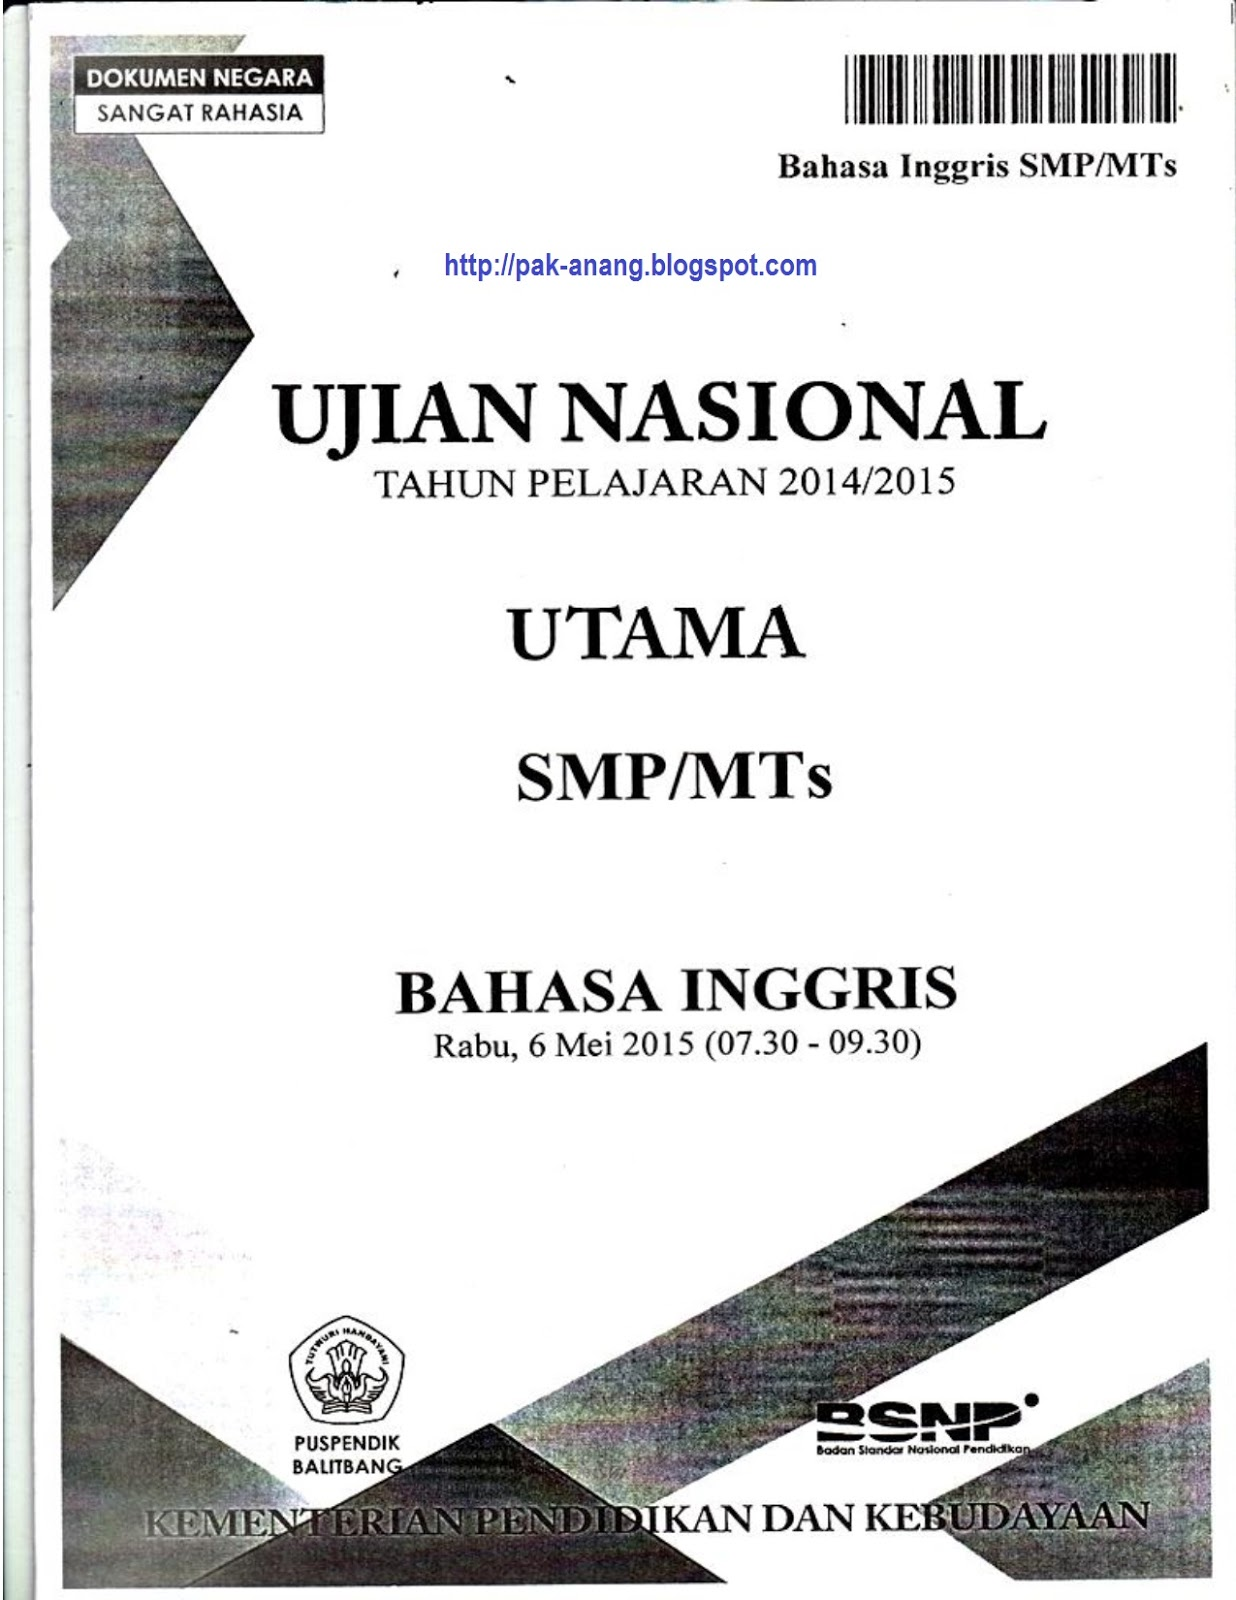 Bank soal un ipa smp - Download Soal Un Bahasa Indonesia Smp 2015